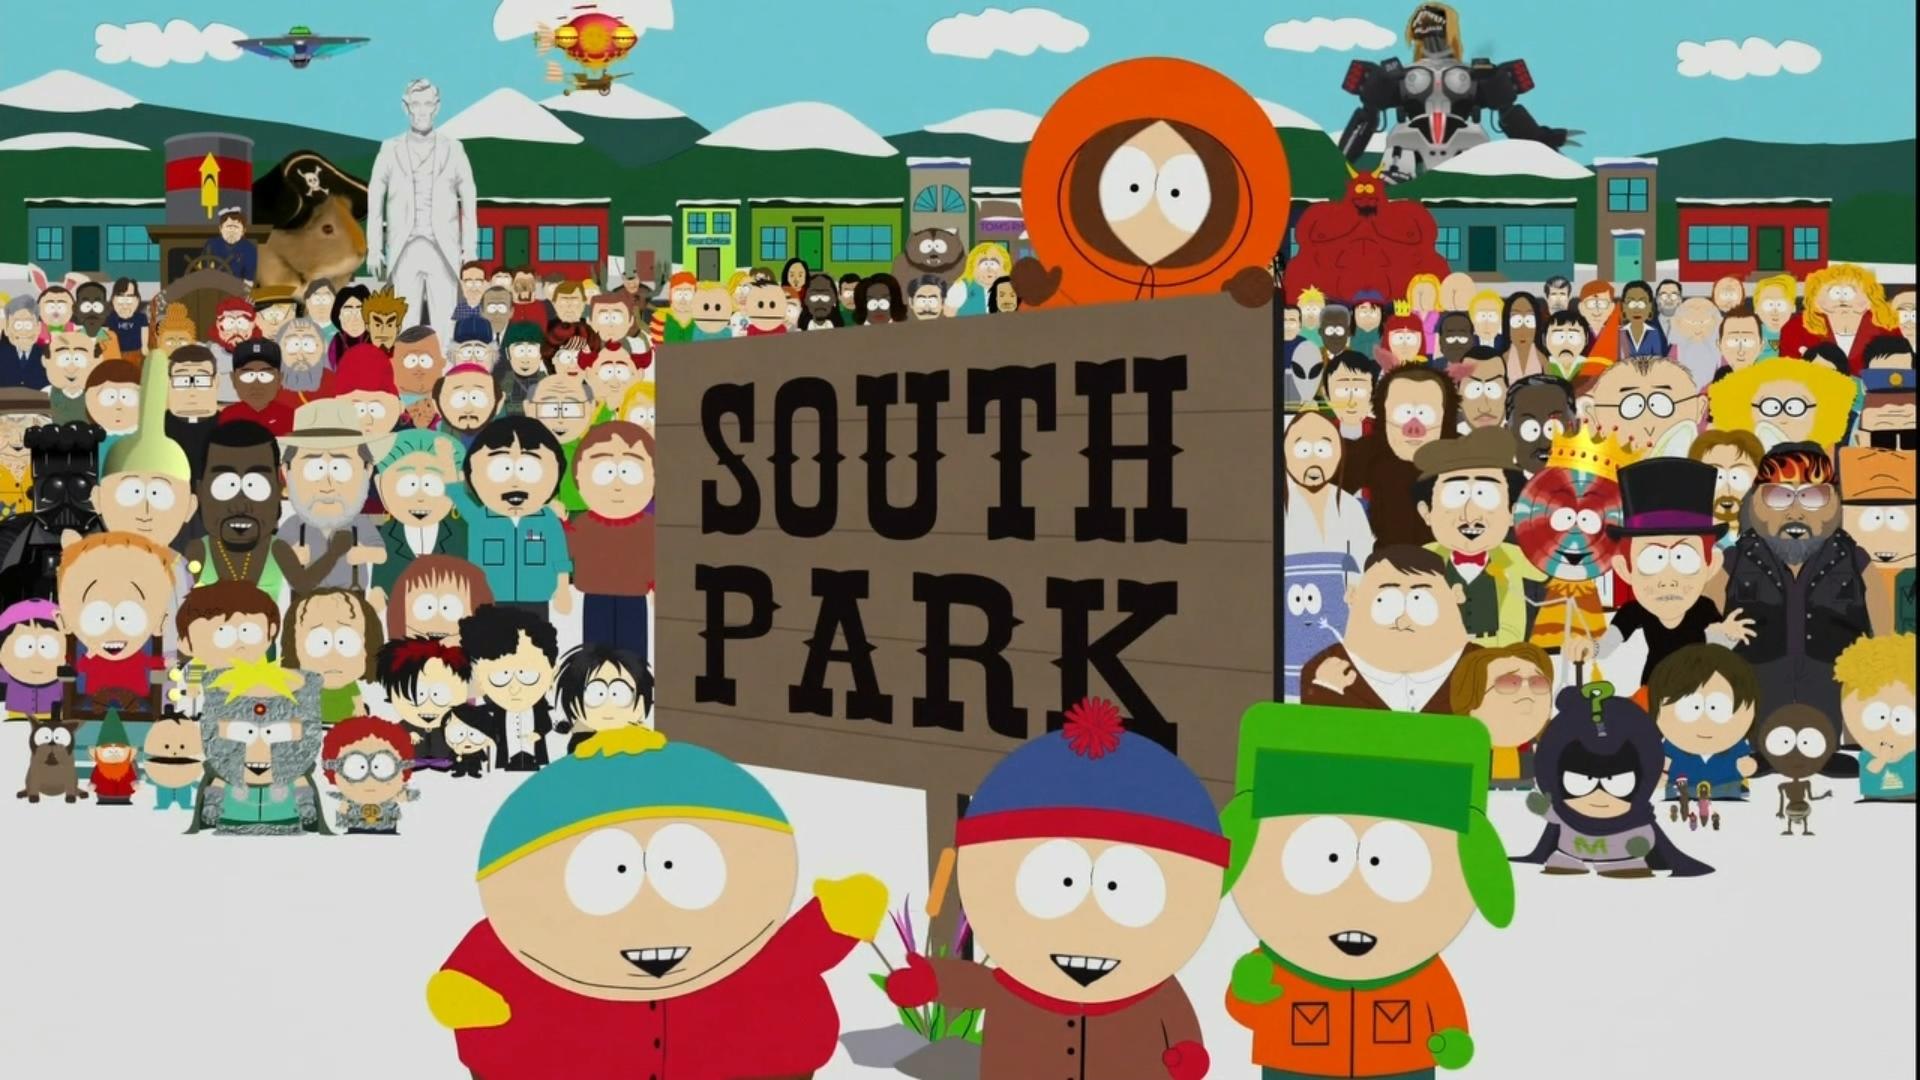 south park wallpaper #6928384